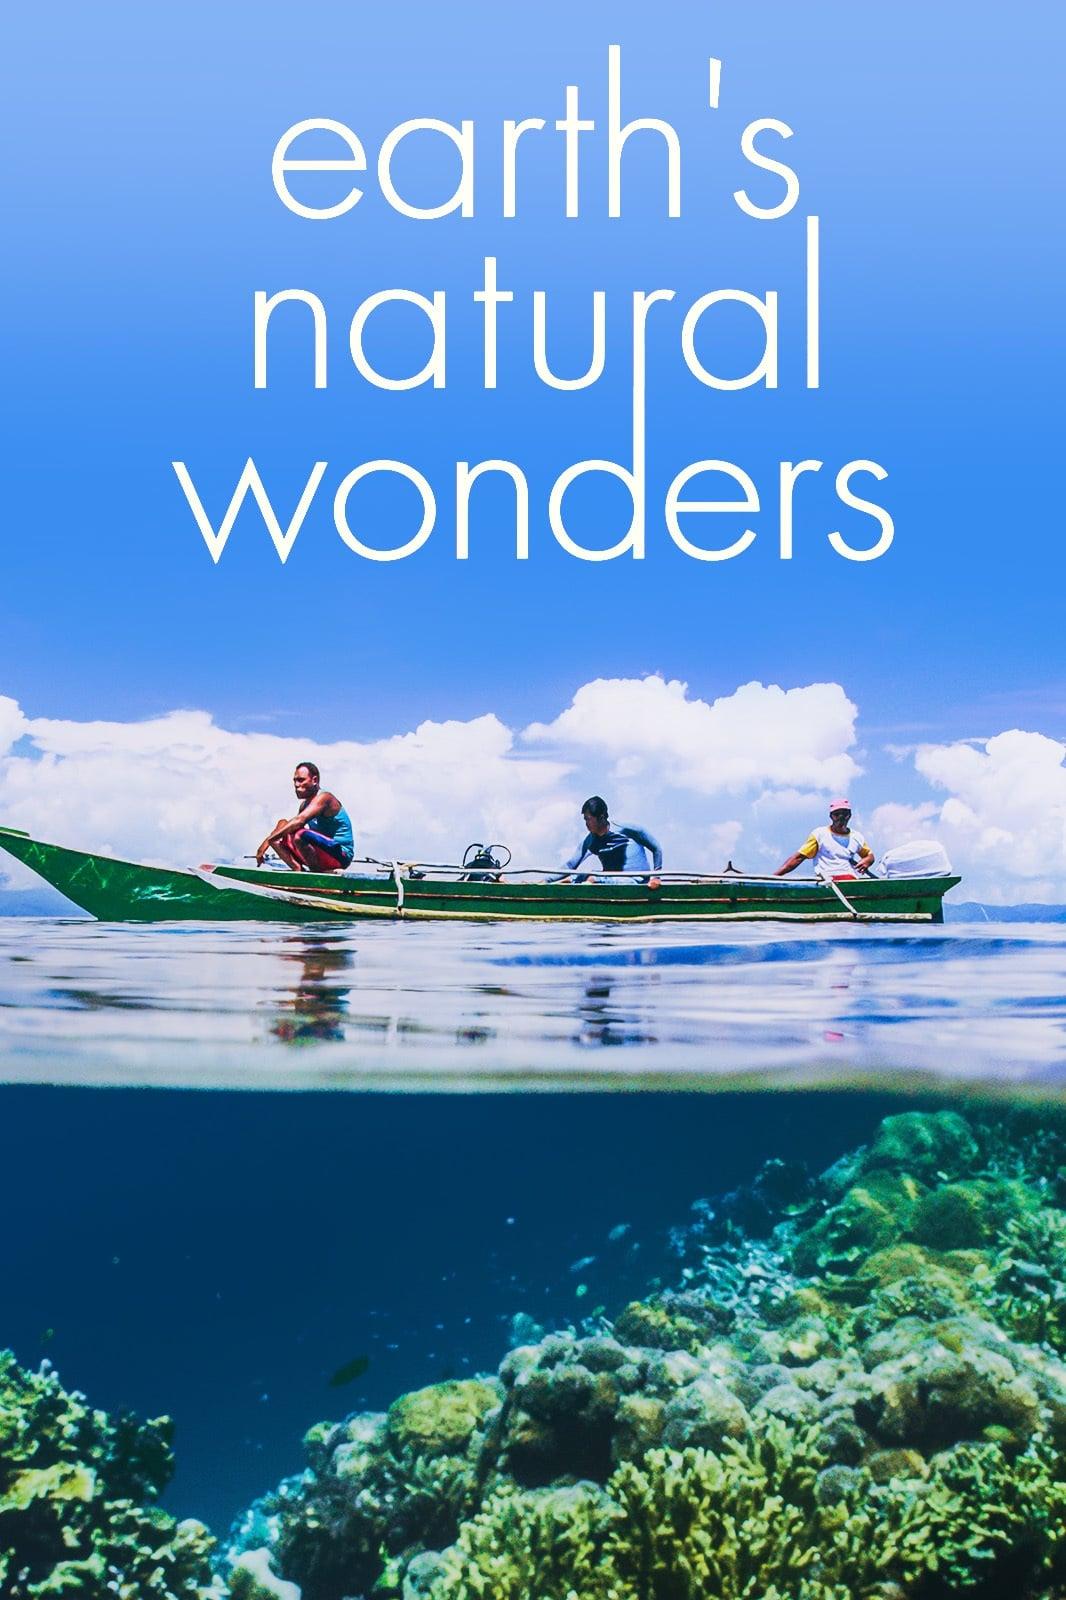 Earth's Natural Wonders